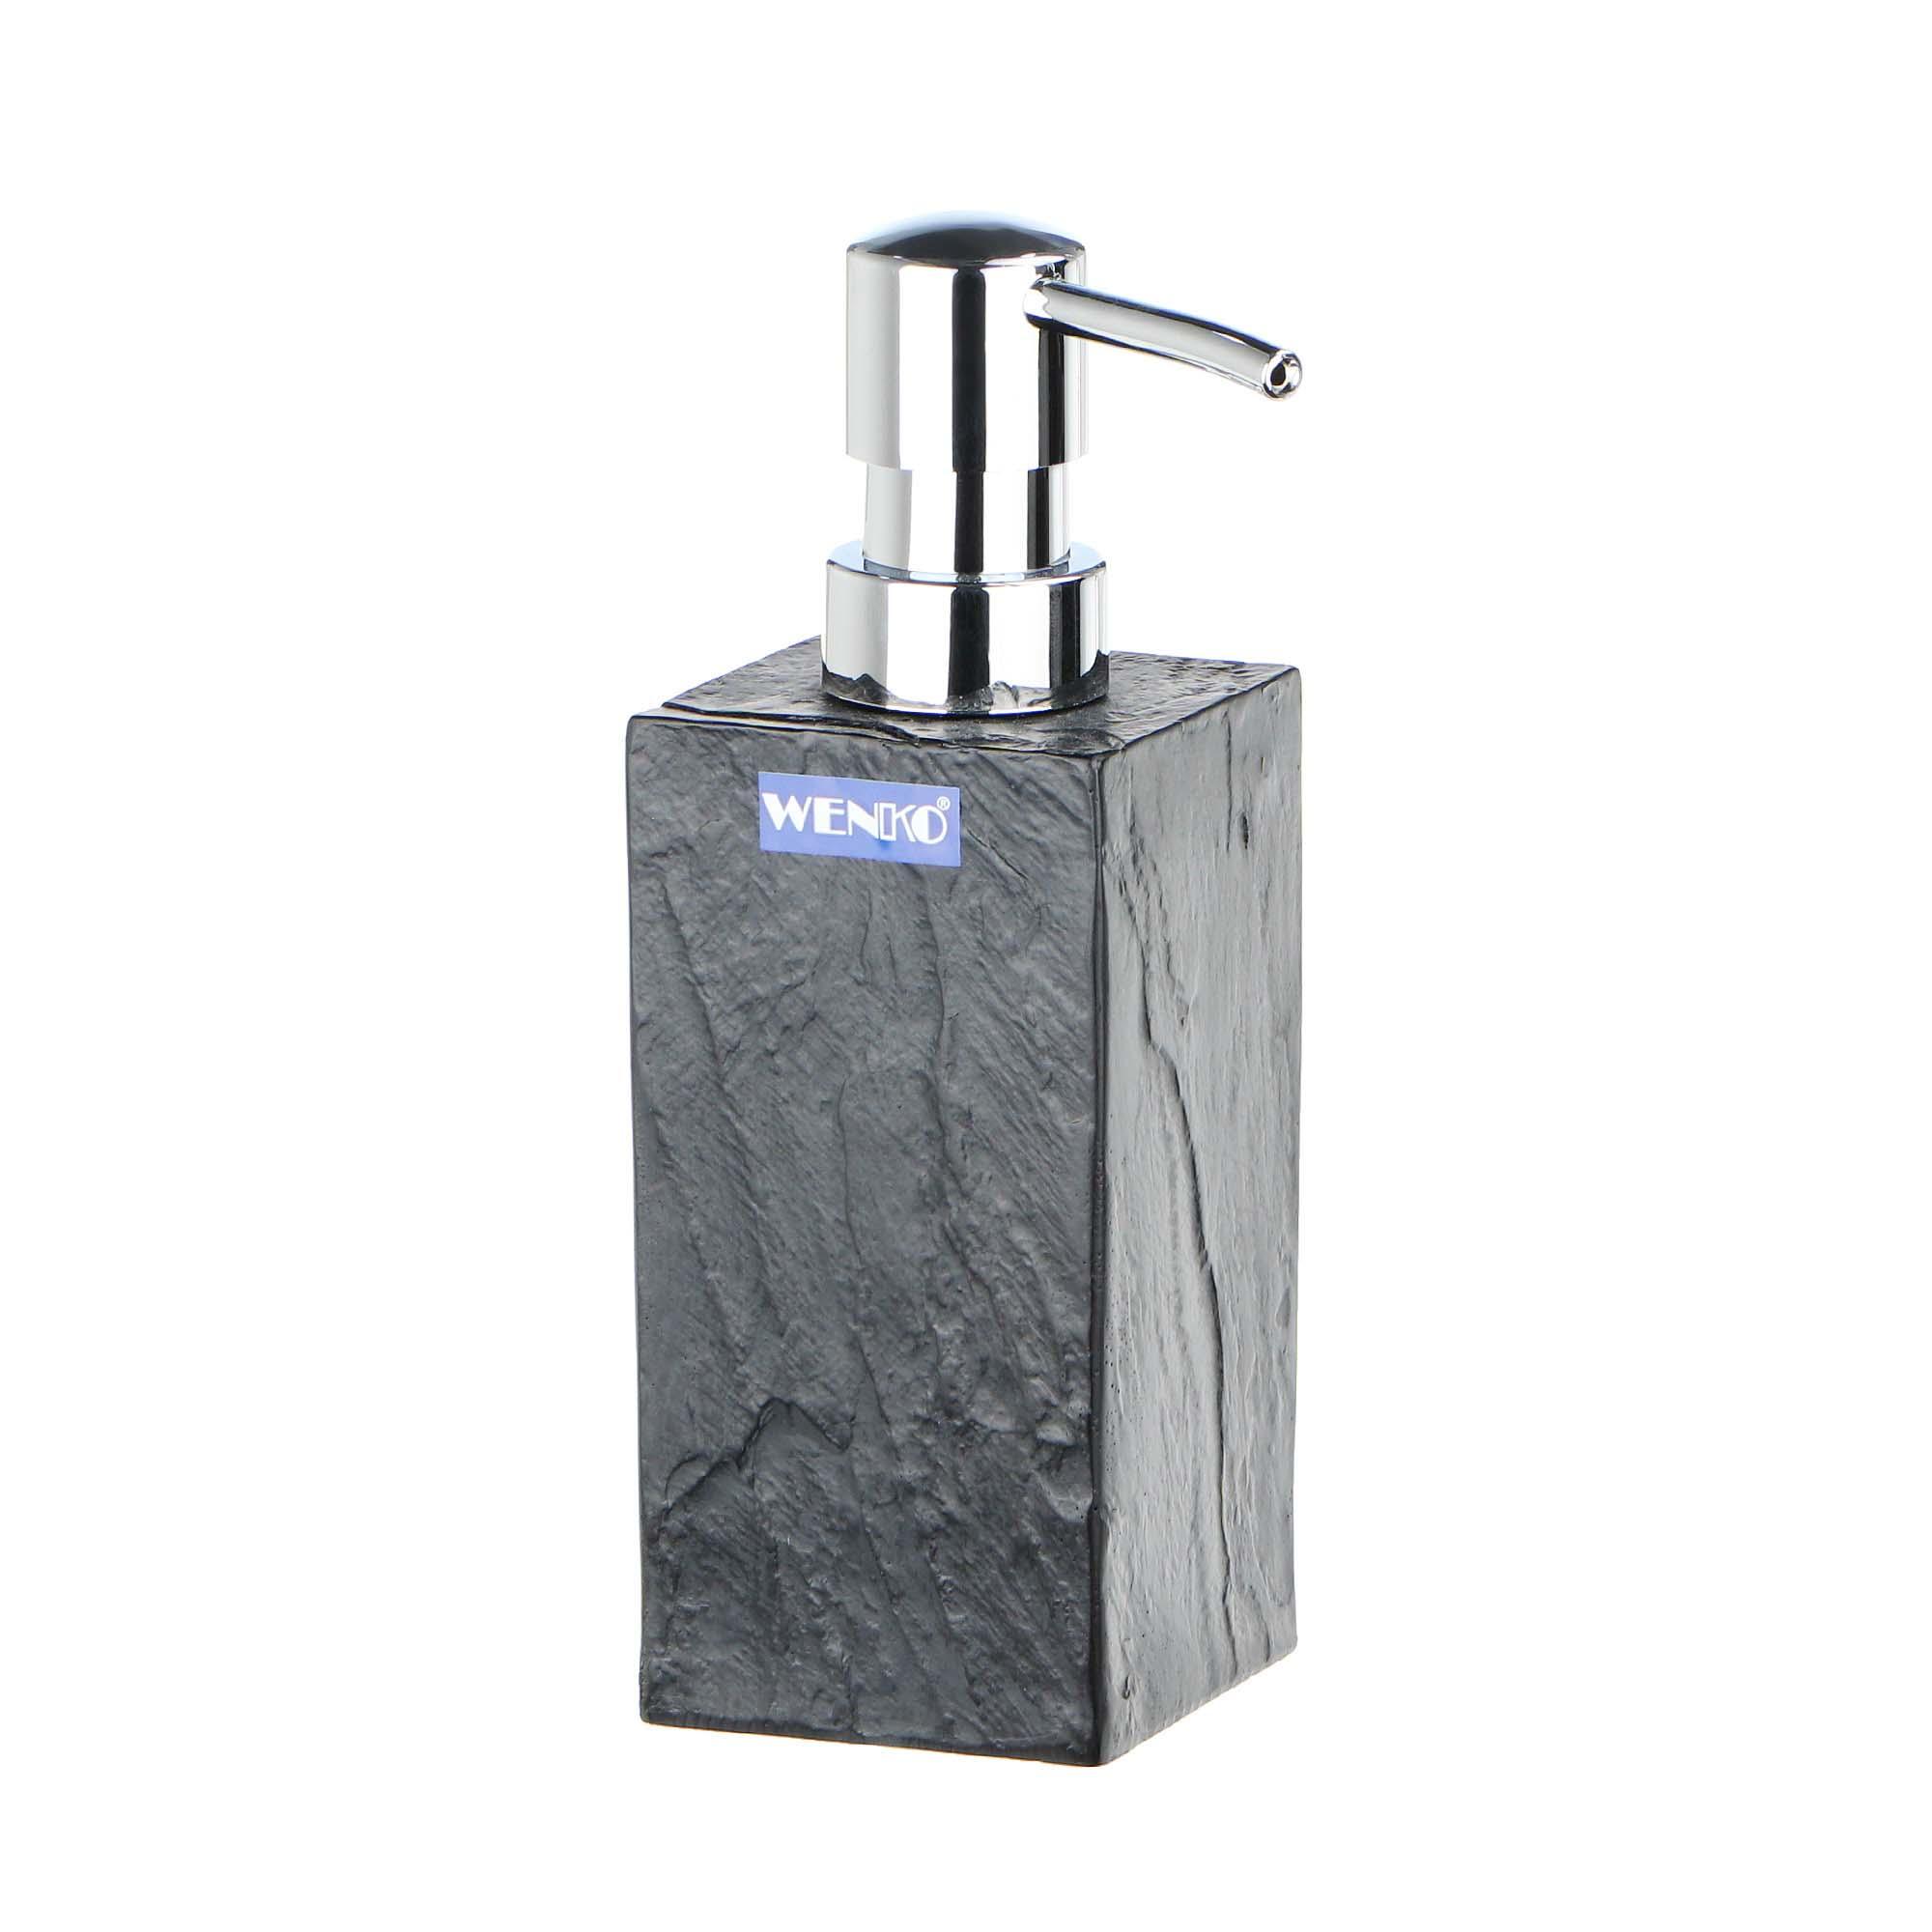 Дозатор для мыла Wenko sanitary state rock дозатор для мыла wenko sanitary goa бежевый